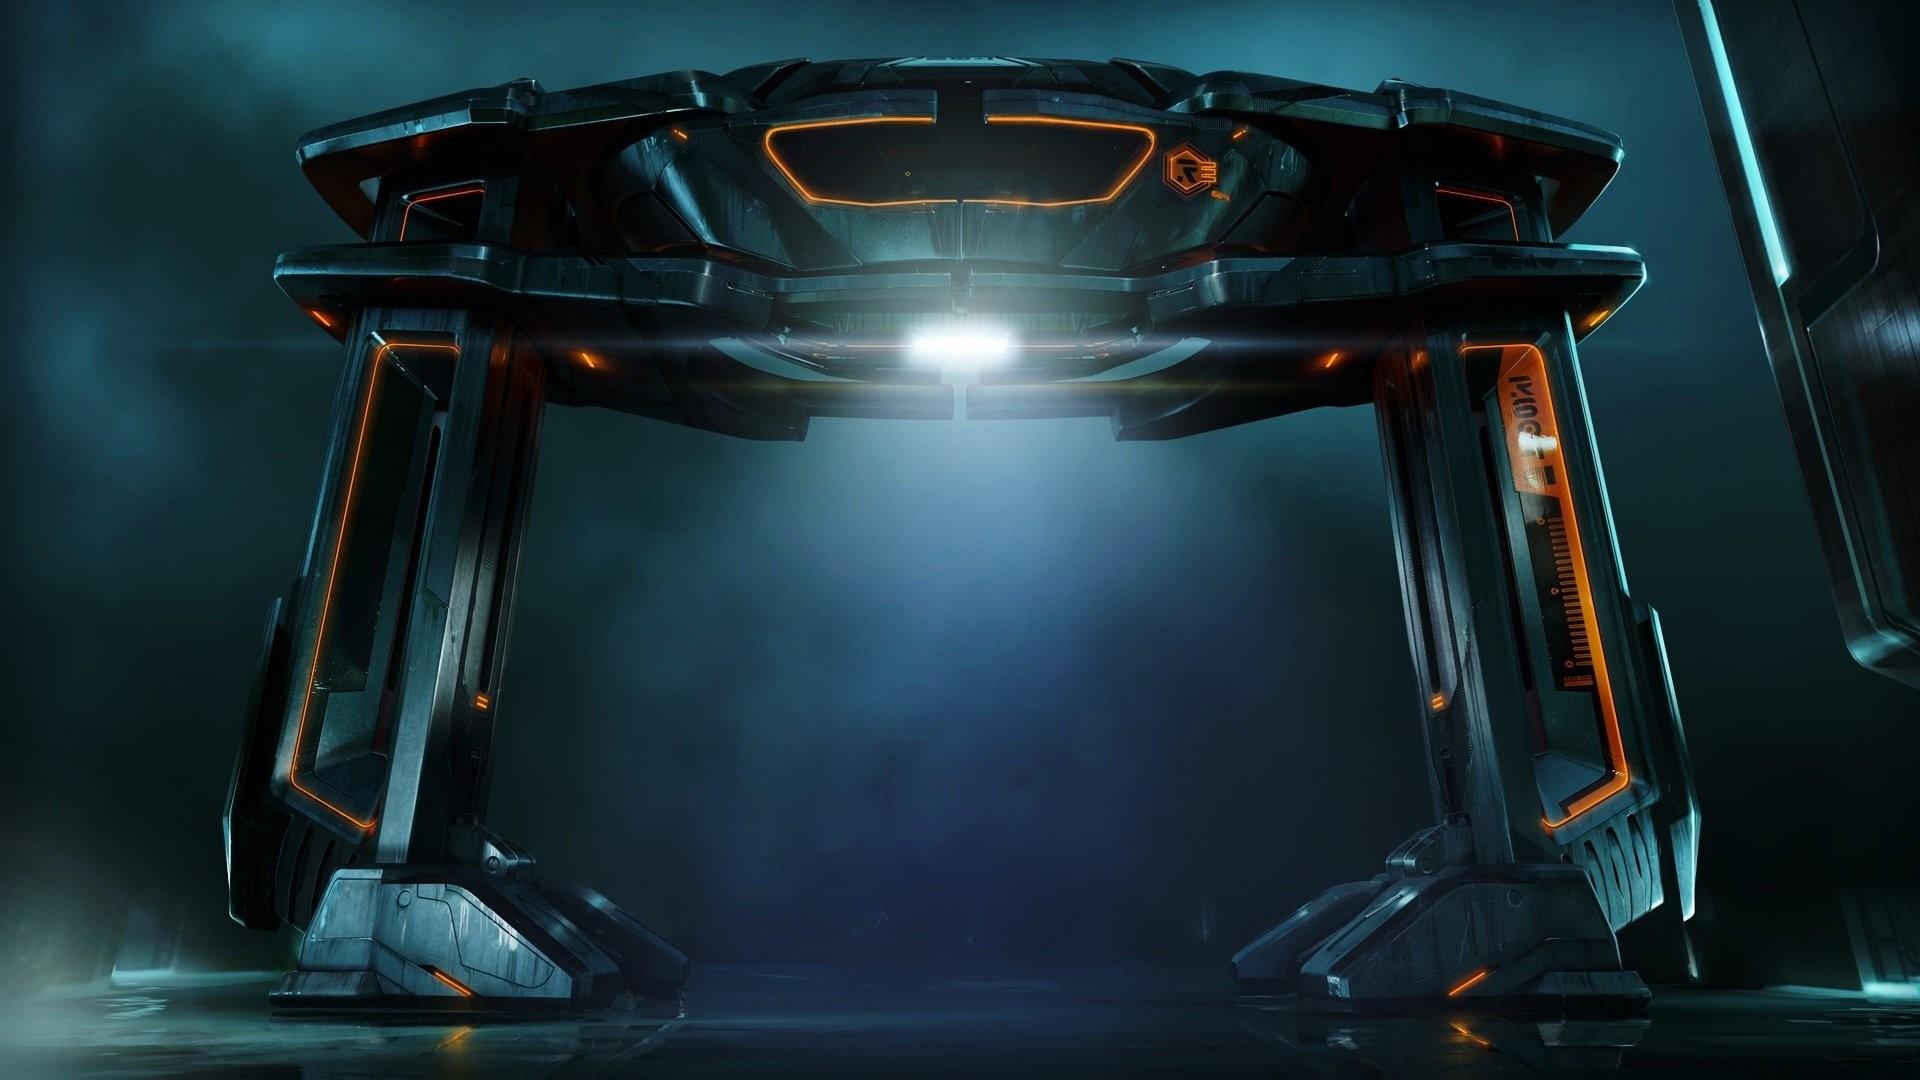 Movie – TRON: Legacy CGI Dark Tron Legacy Wallpaper